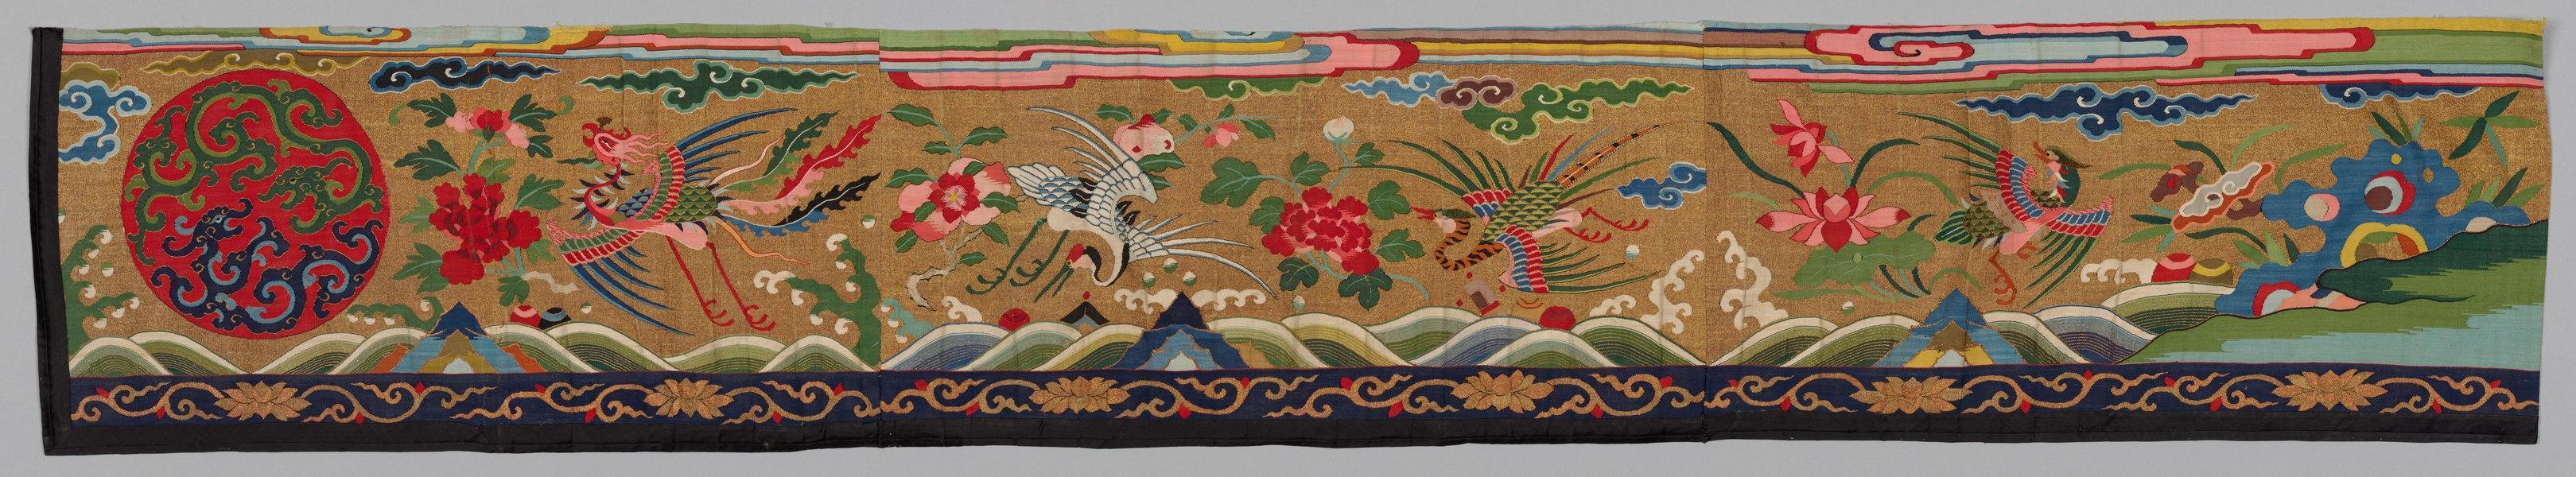 silk tapestry - image 10